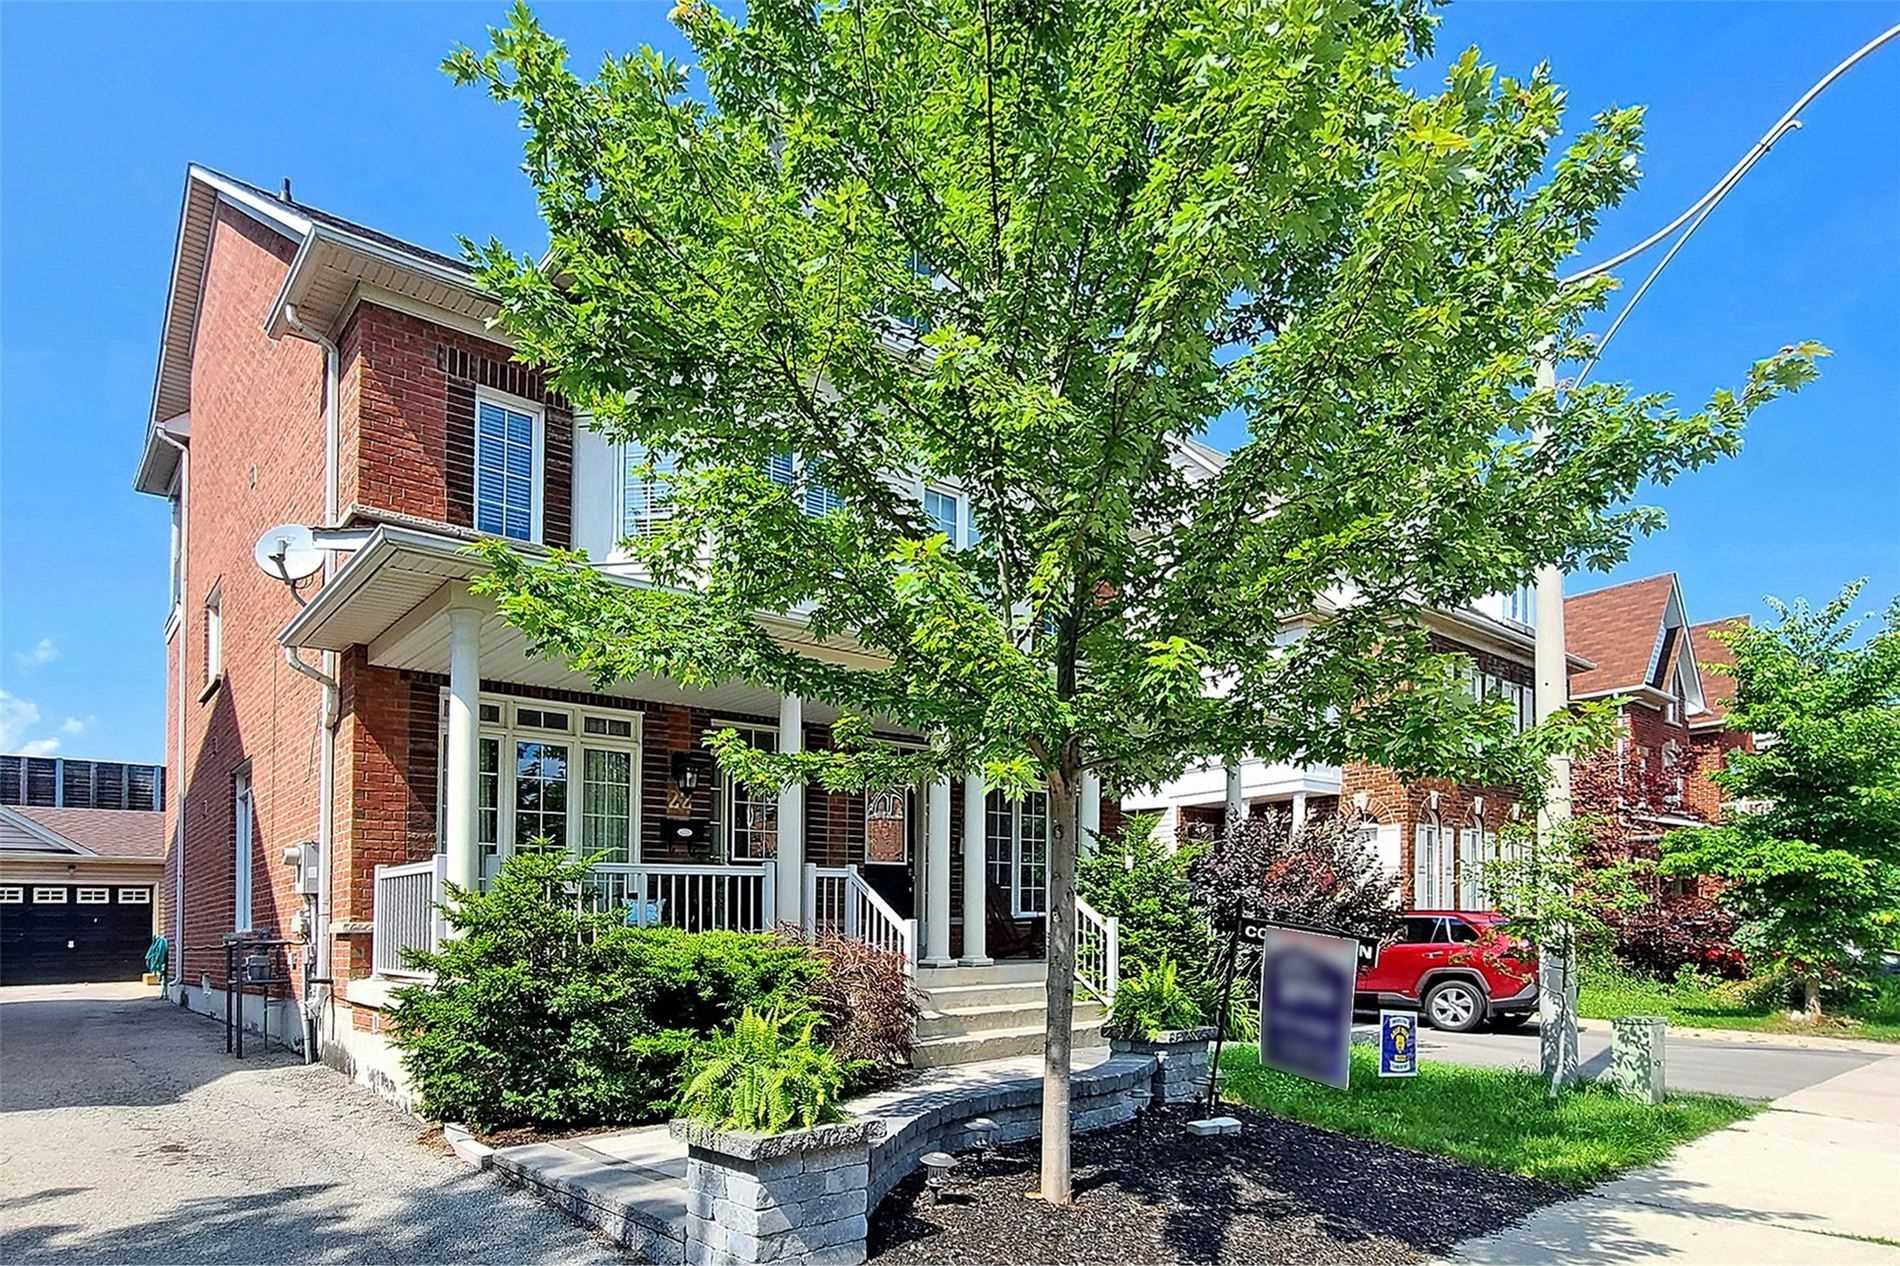 Semi-Detached For Sale In Toronto , 3 Bedrooms Bedrooms, ,3 BathroomsBathrooms,Semi-Detached,For Sale,Enroutes